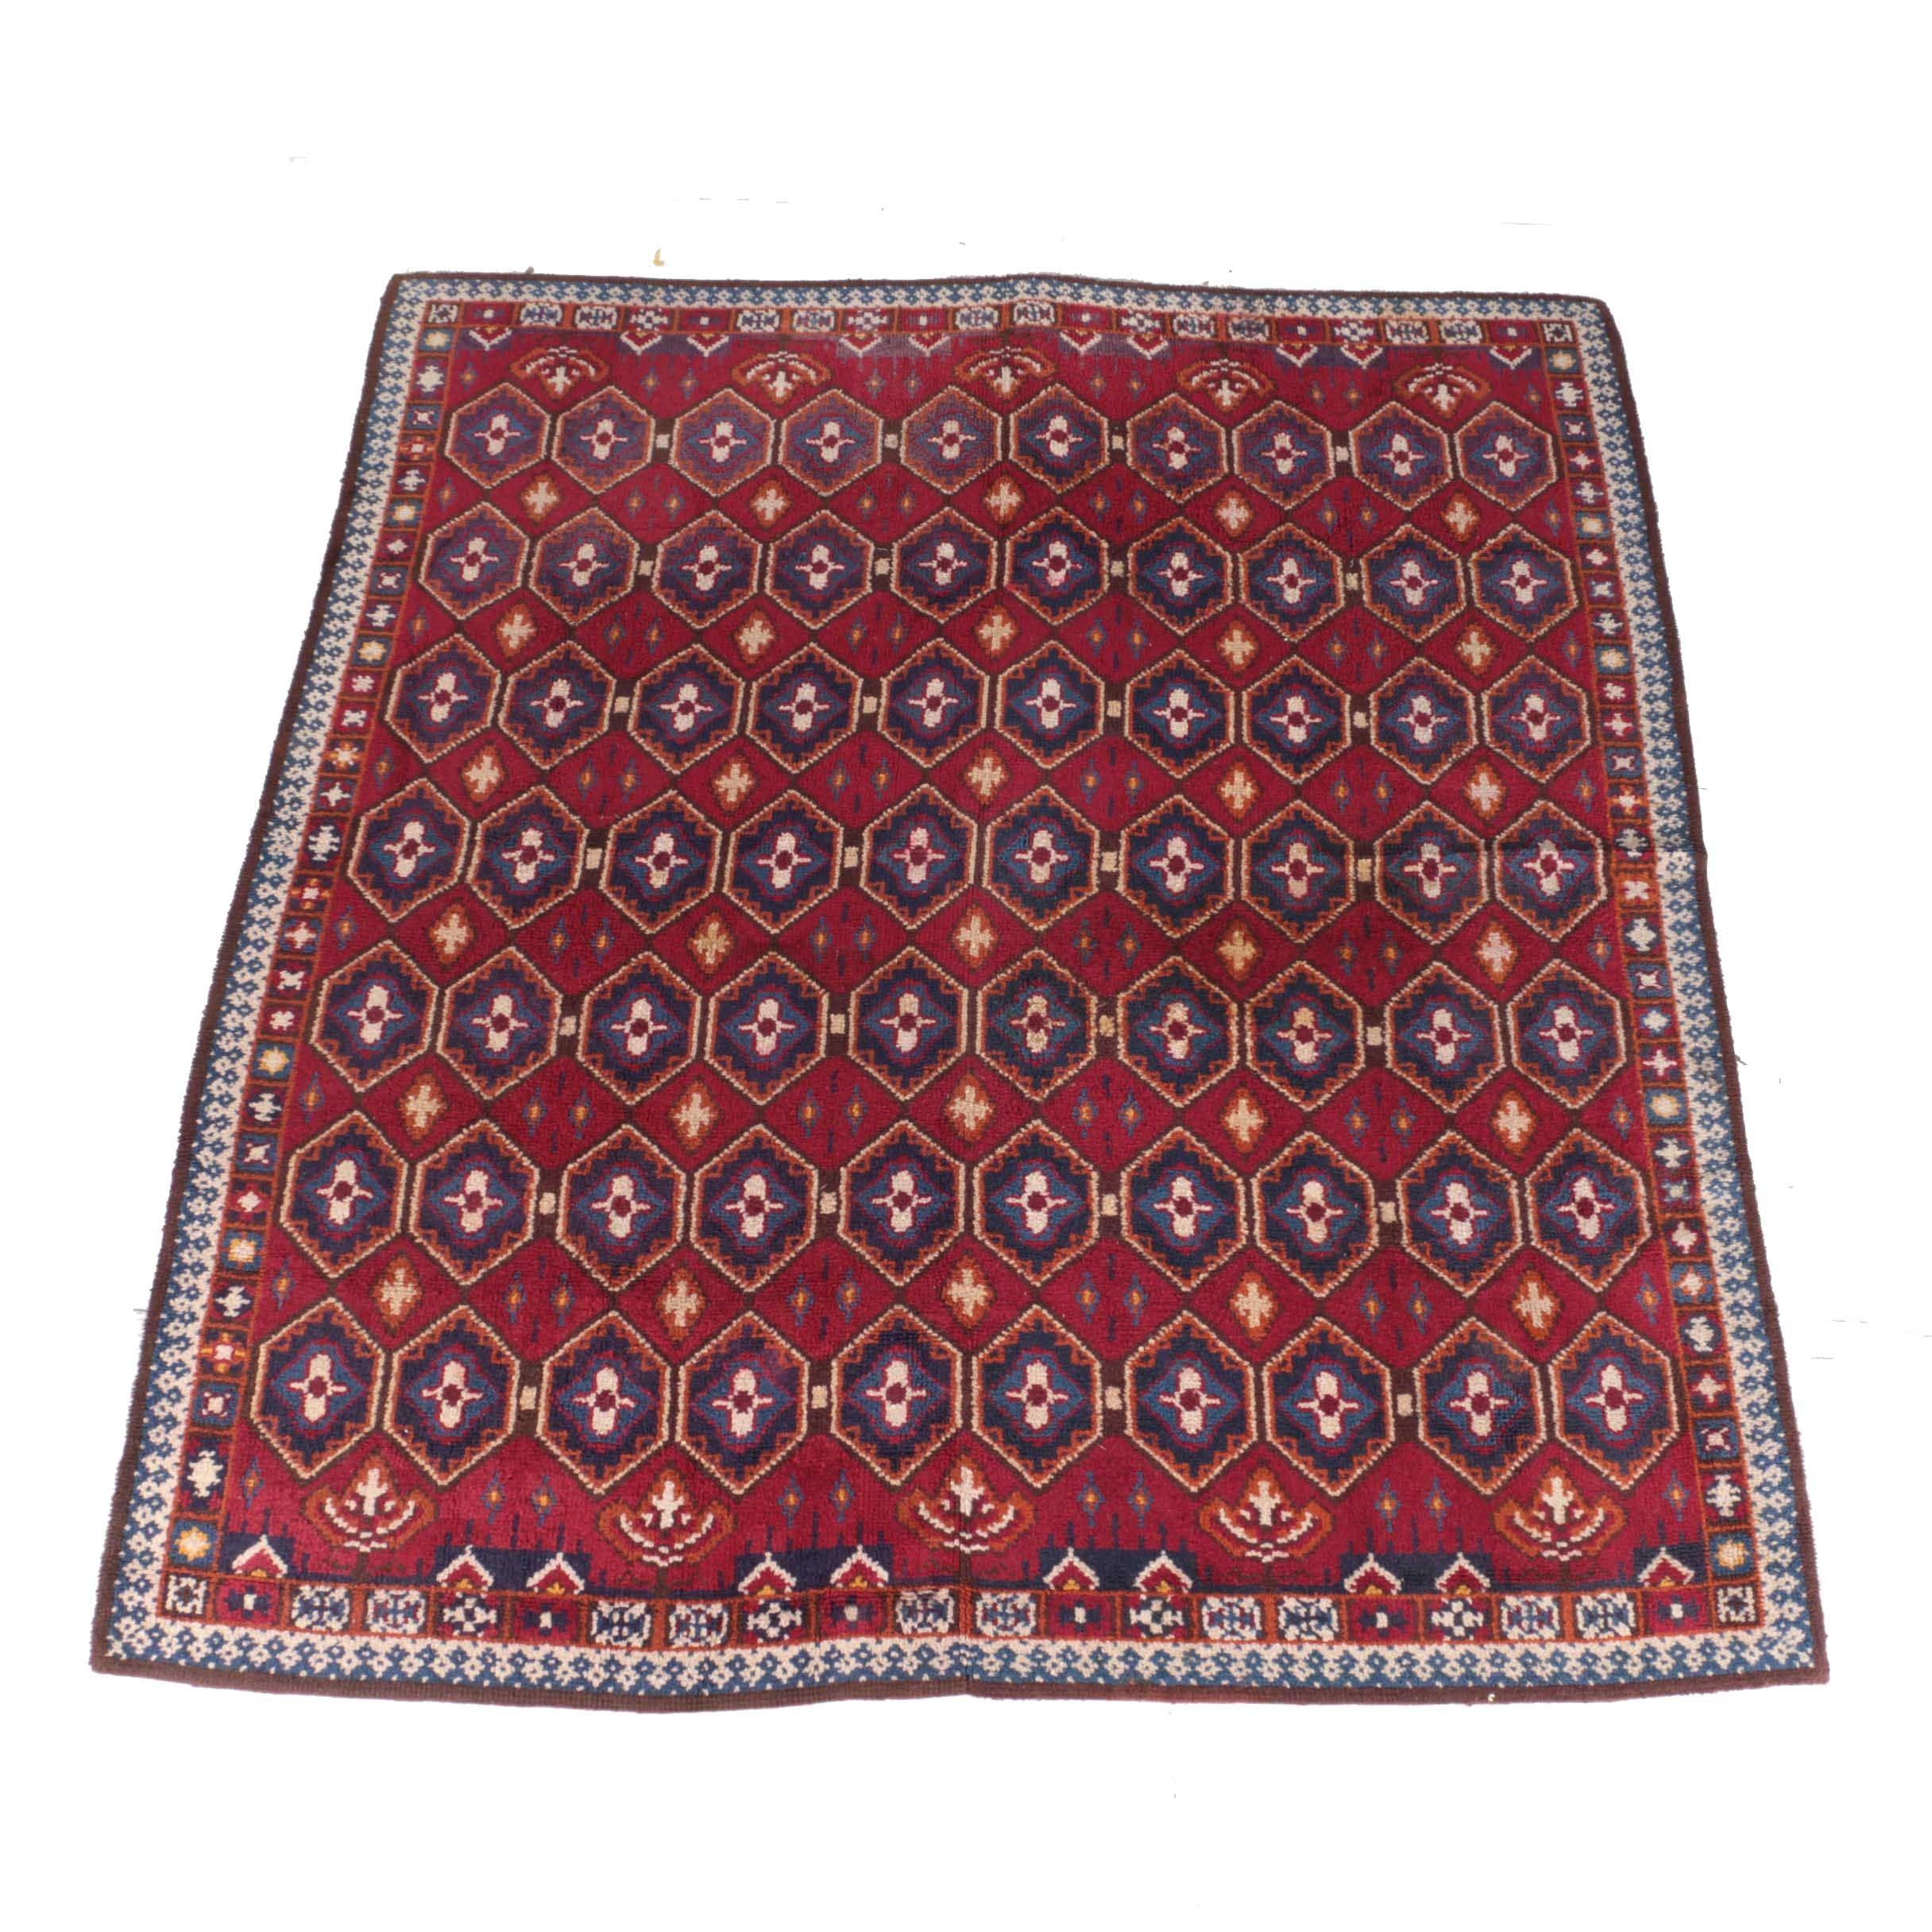 Hooked Turkish Style Area Rug